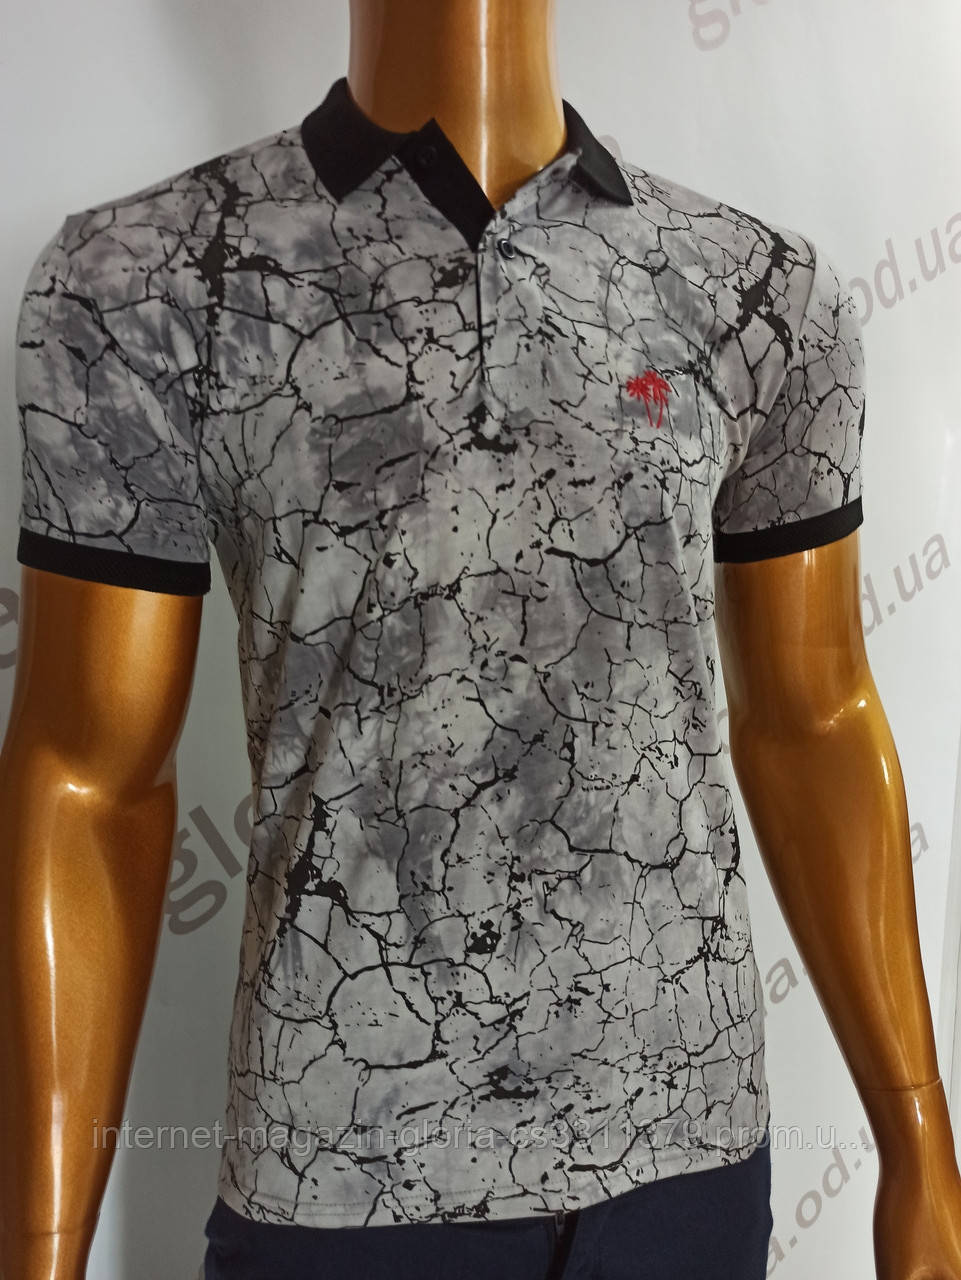 Мужская футболка Поло, MSY. 11232-8334(grey). Размеры: M,L,XL,XXL.